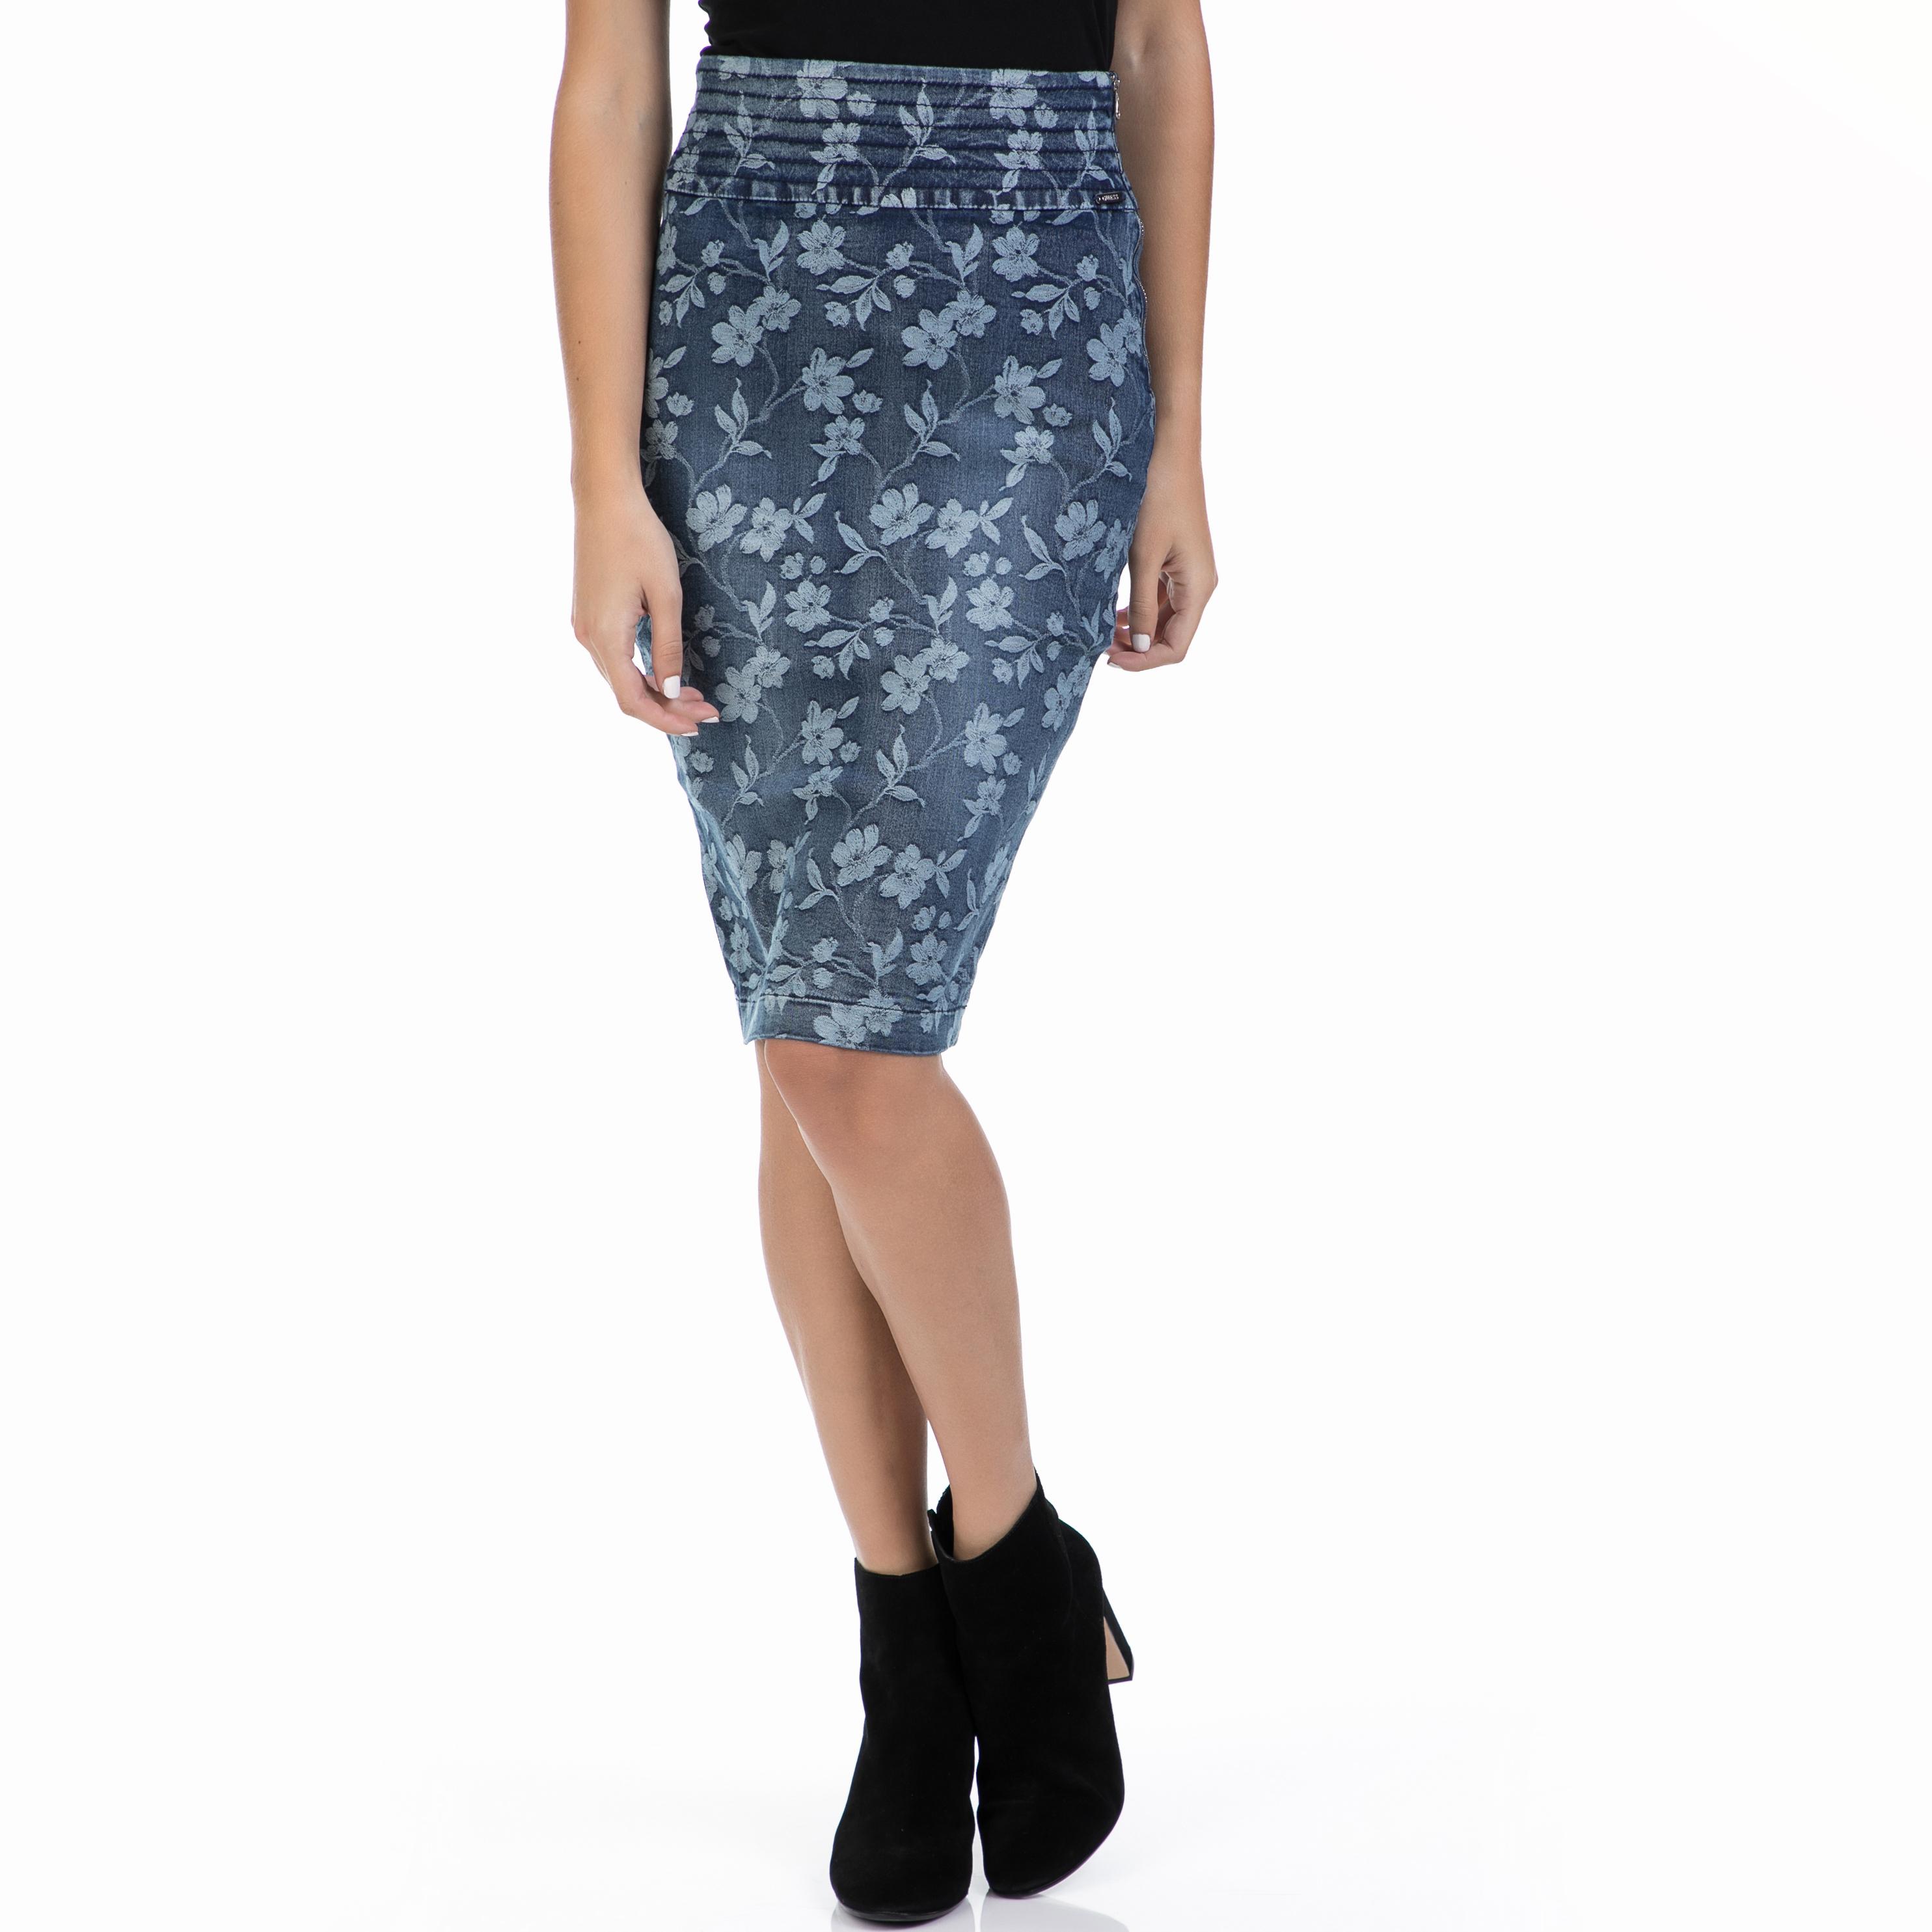 GUESS – Γυναικεία φούστα GUESS μπλε